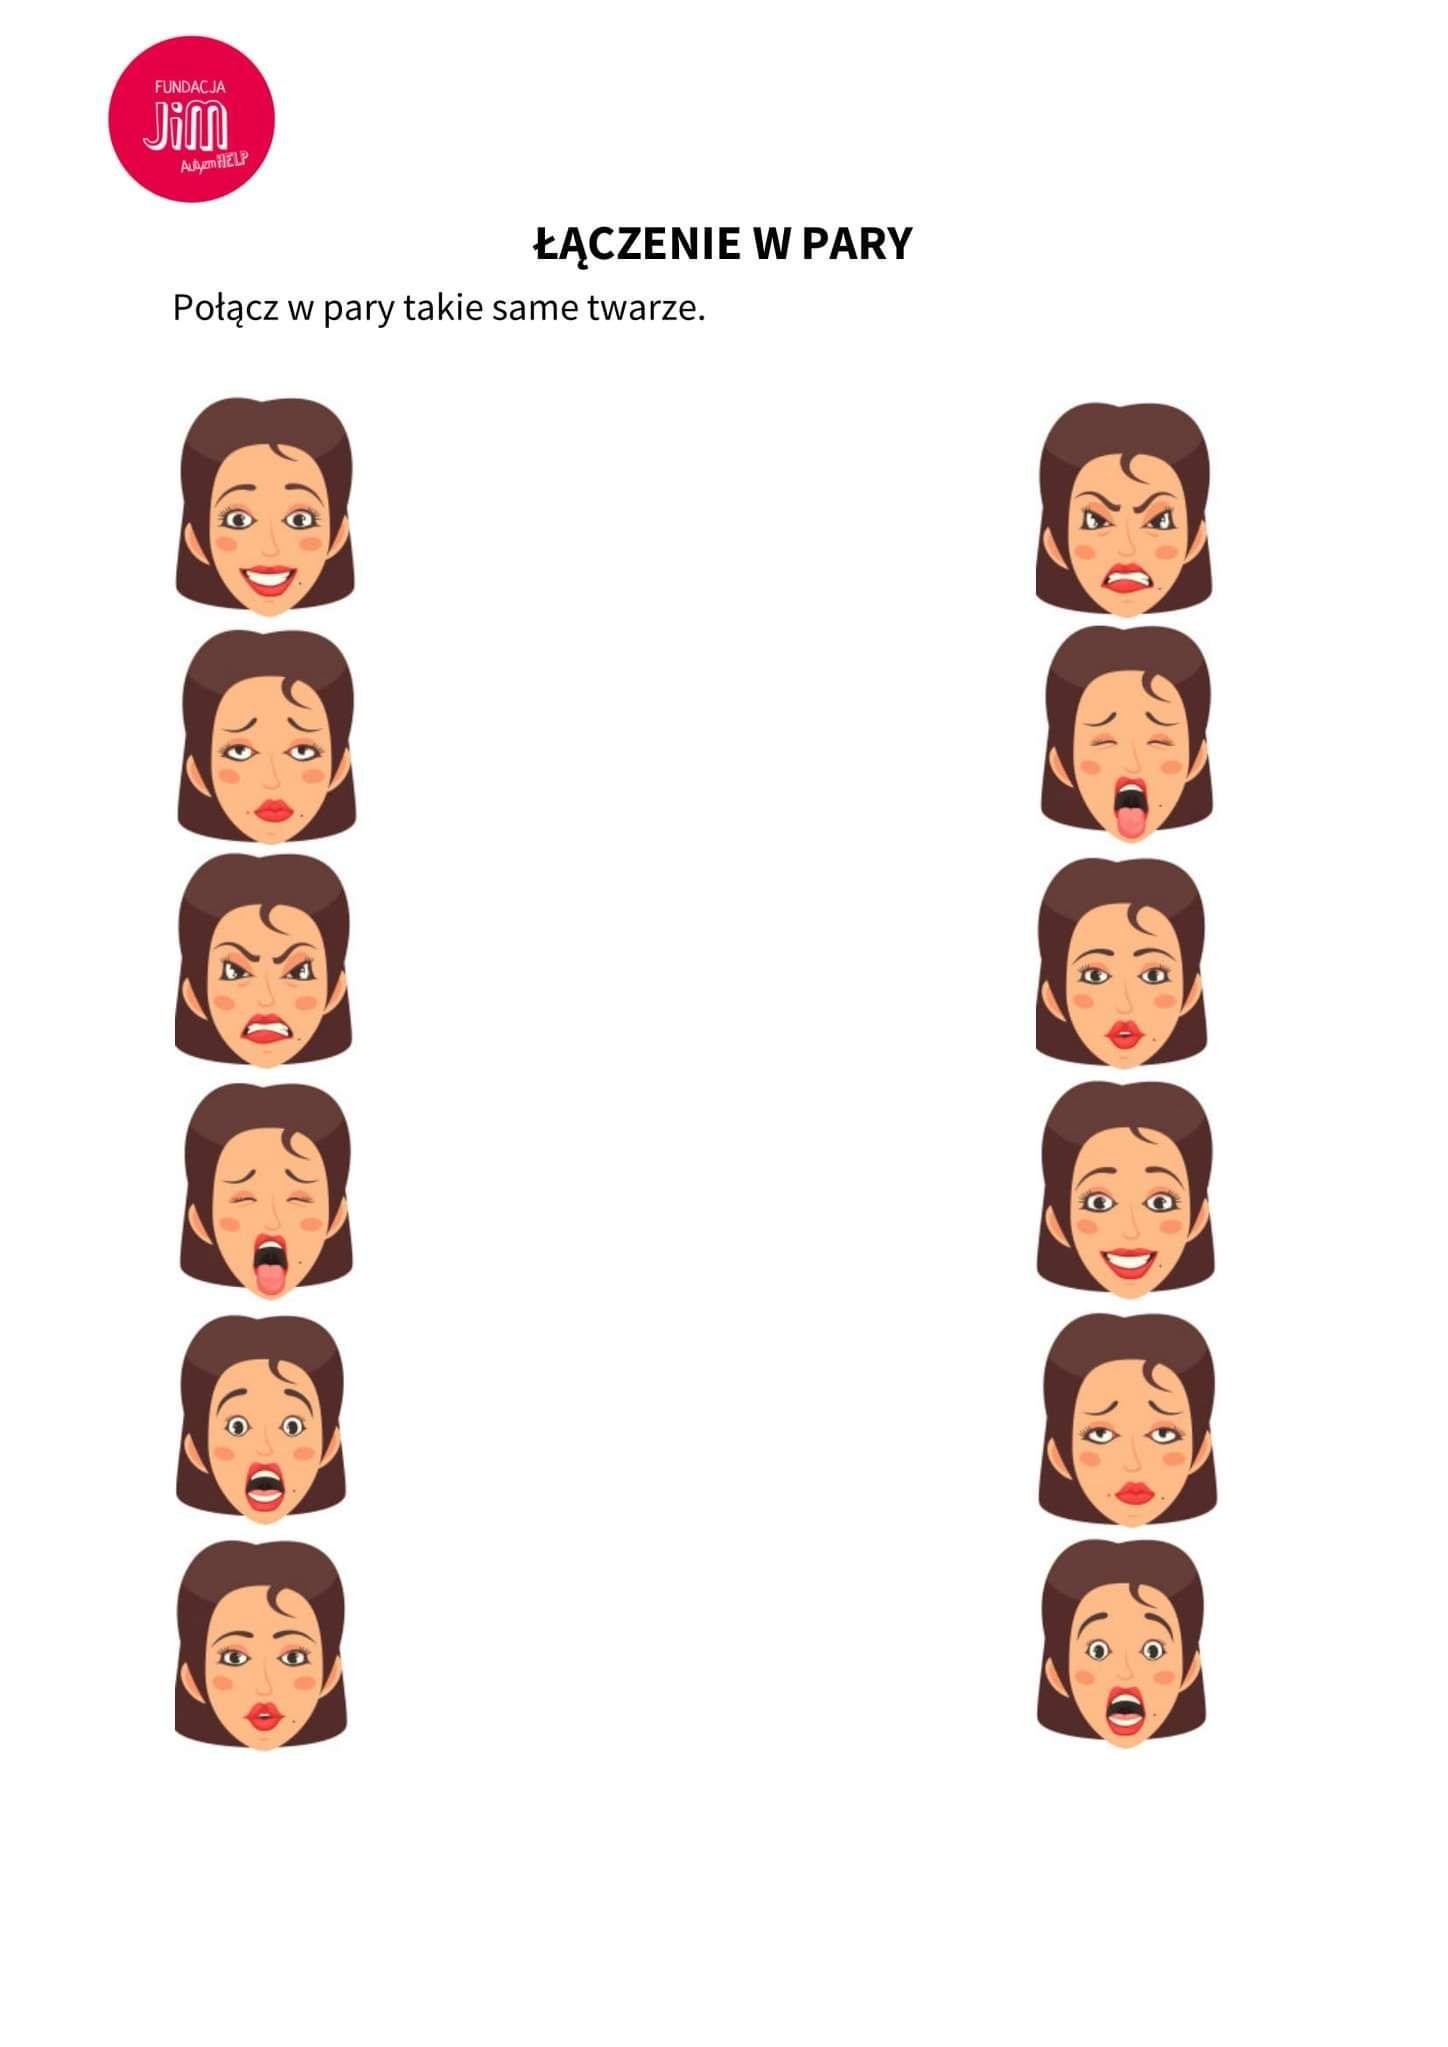 Pin By Faustyna Plajstek On Emocje Zachowanie Emotions Behavior Zdrowie In 2020 Education Face Vault Boy